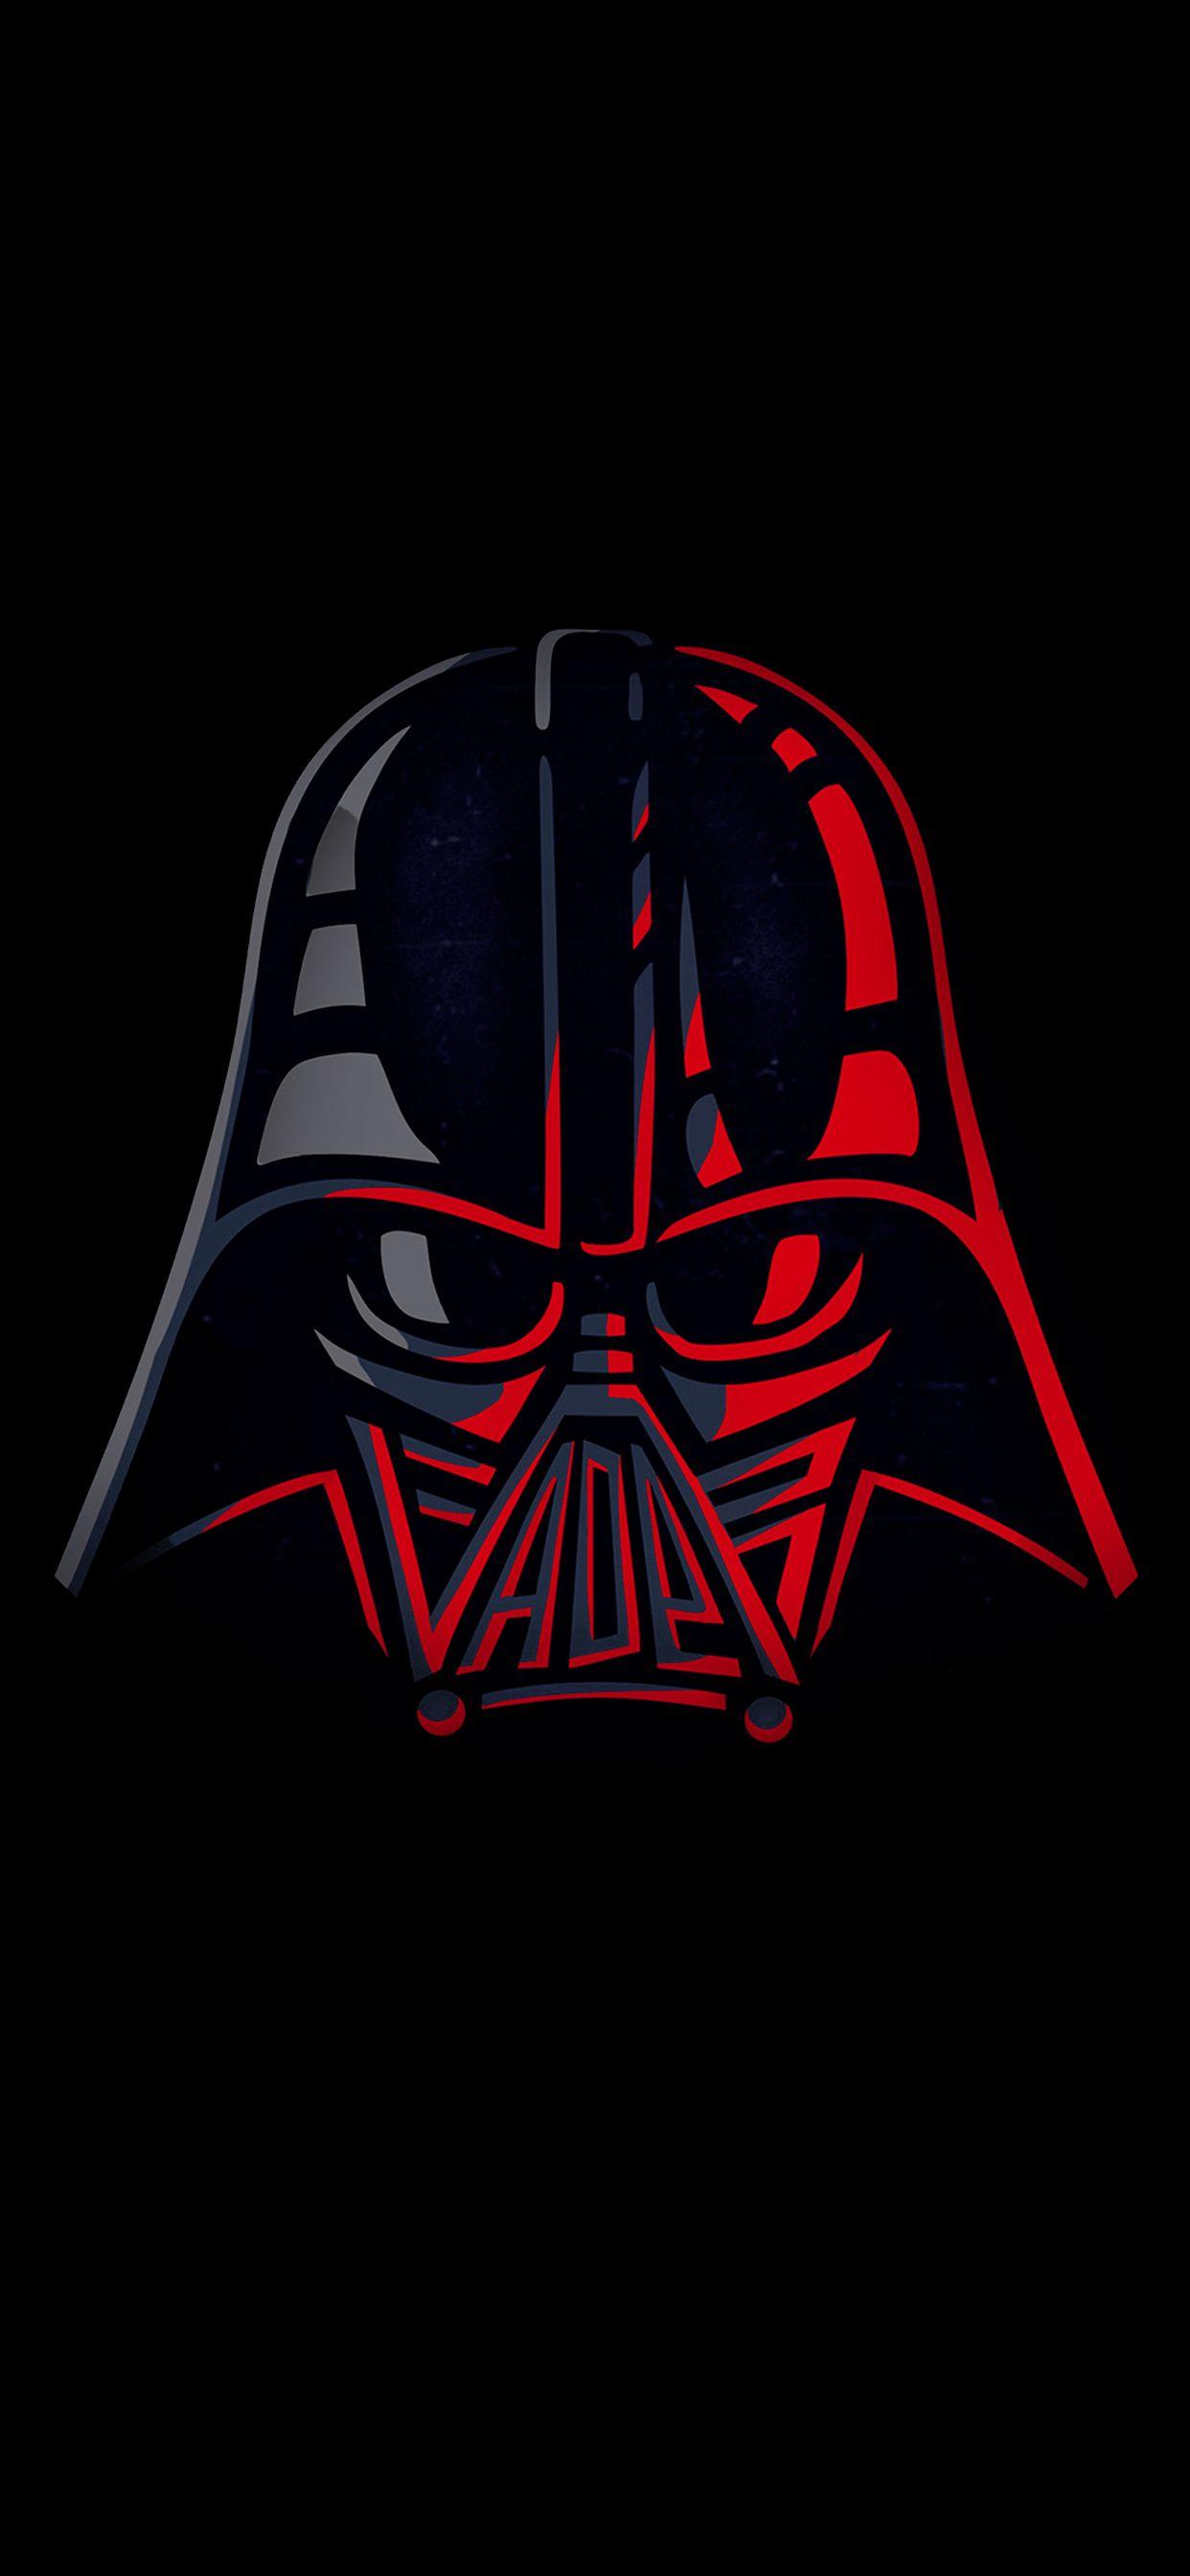 Darth Vader 4k 2019 Star Wars Wallpapers Hd Wallpapers Darth Vader Wallpapers 4k Wallpapers Darth Vader Wallpaper Star Wars Wallpaper Darth Vader